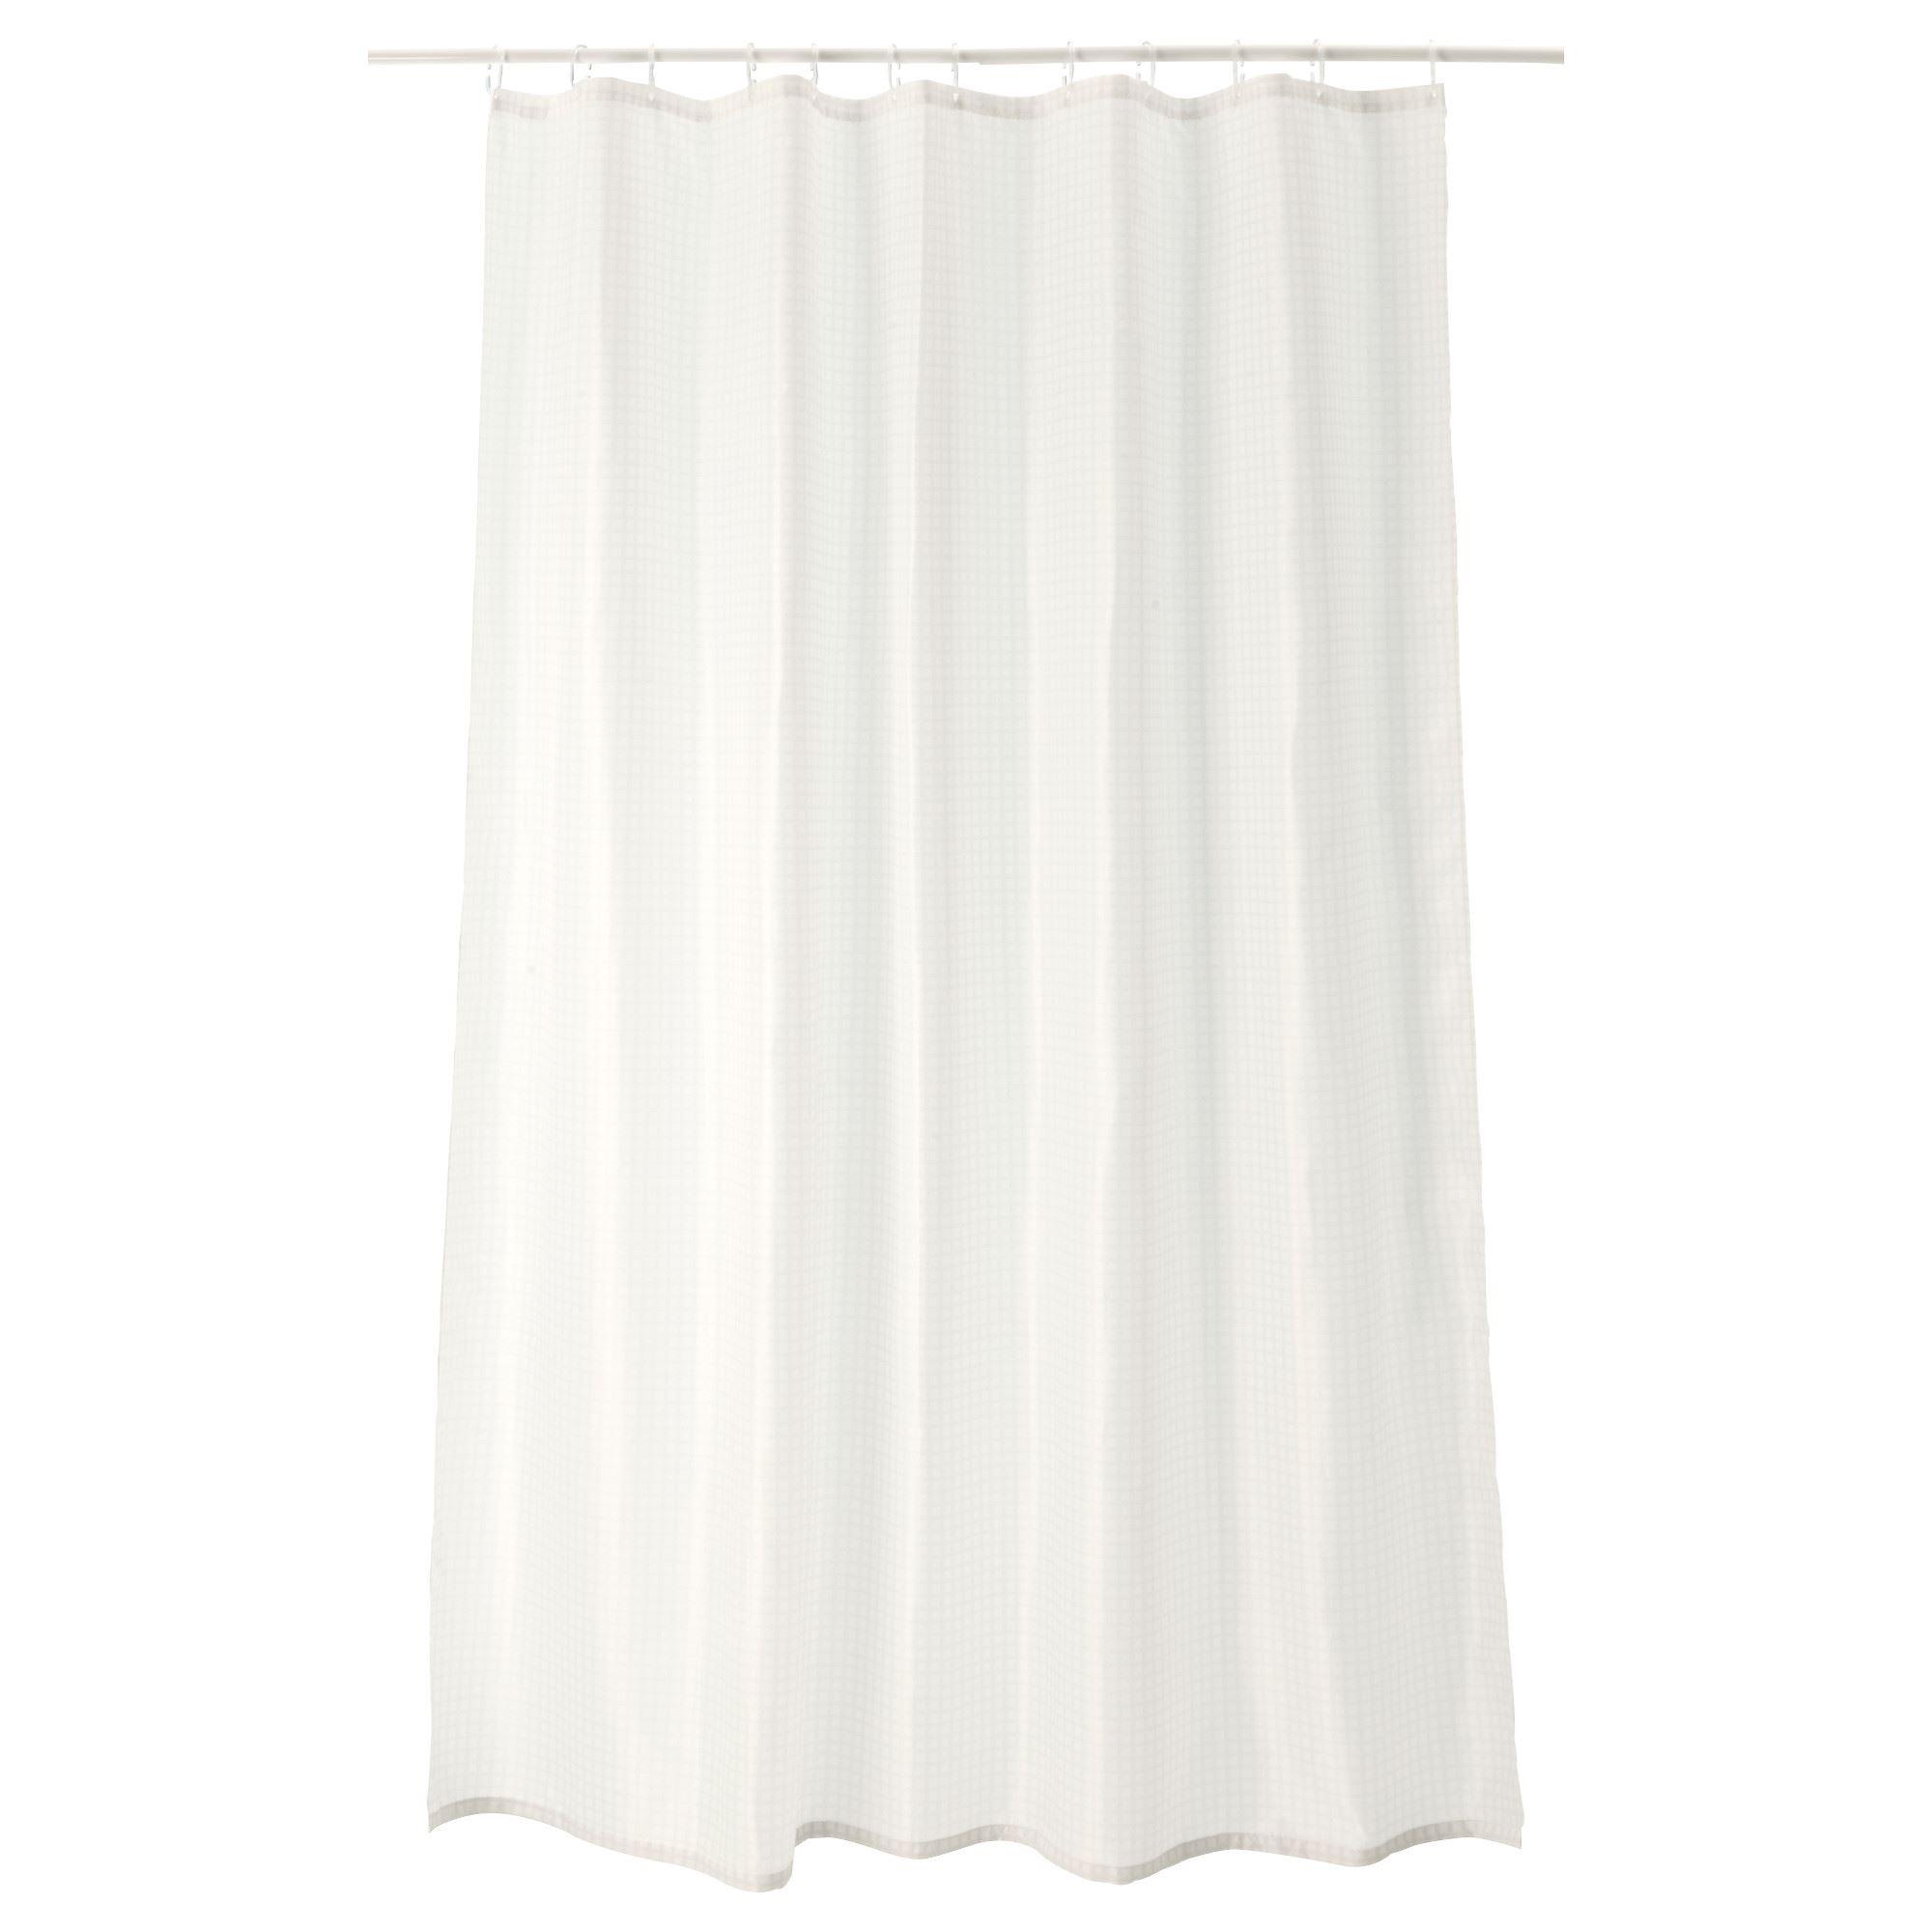 SAXALVEN Shower Curtain White 180x200 Cm